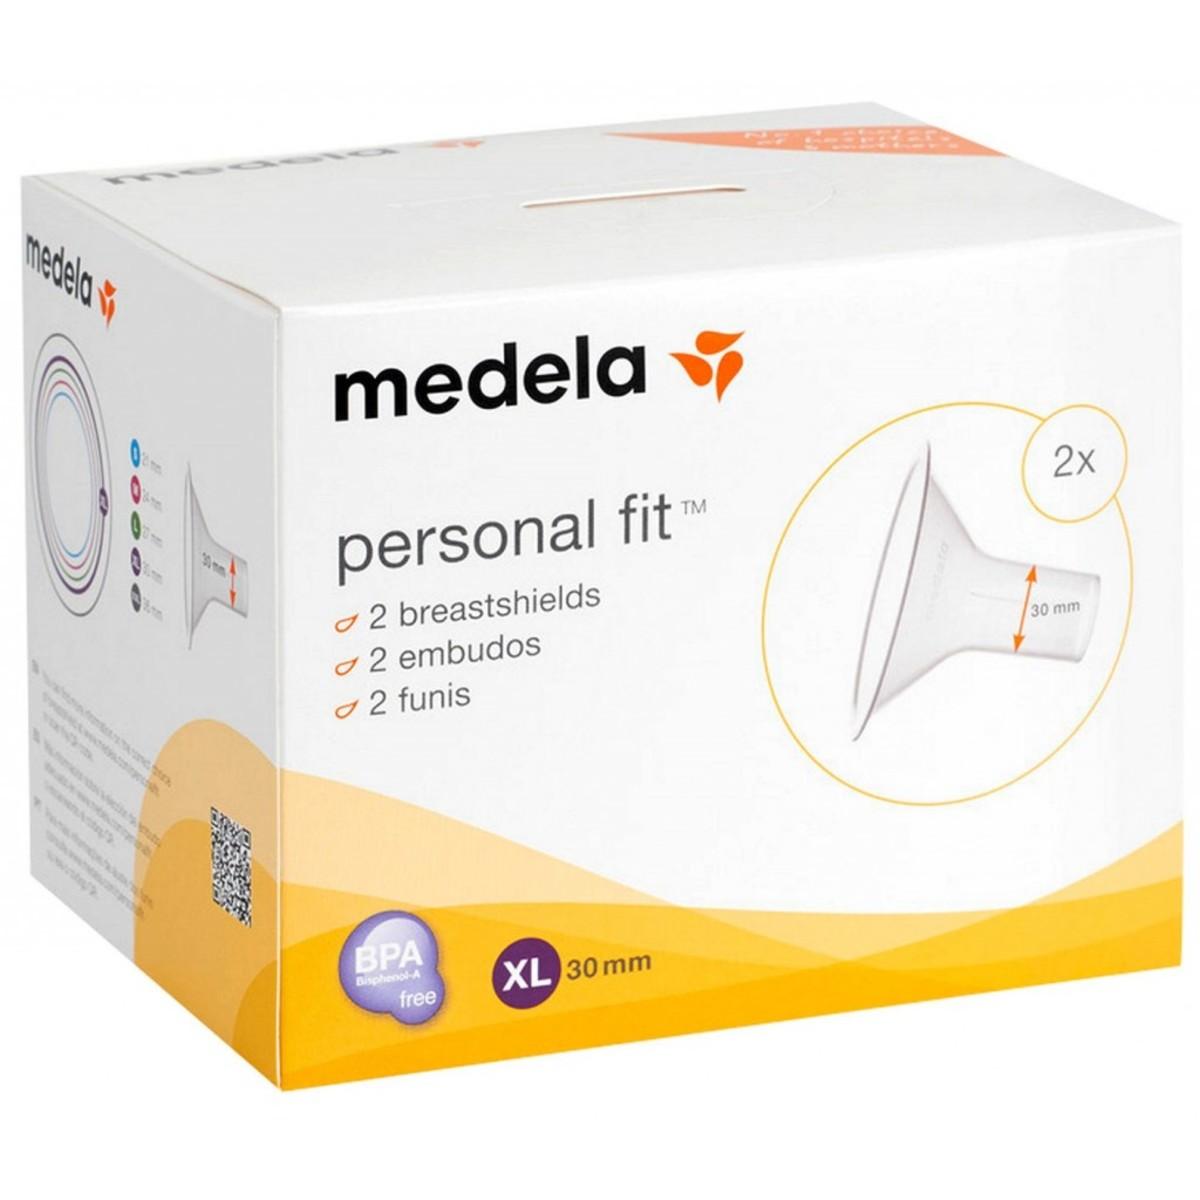 Medela Personal fit (XL size) 2pcs, 30mm